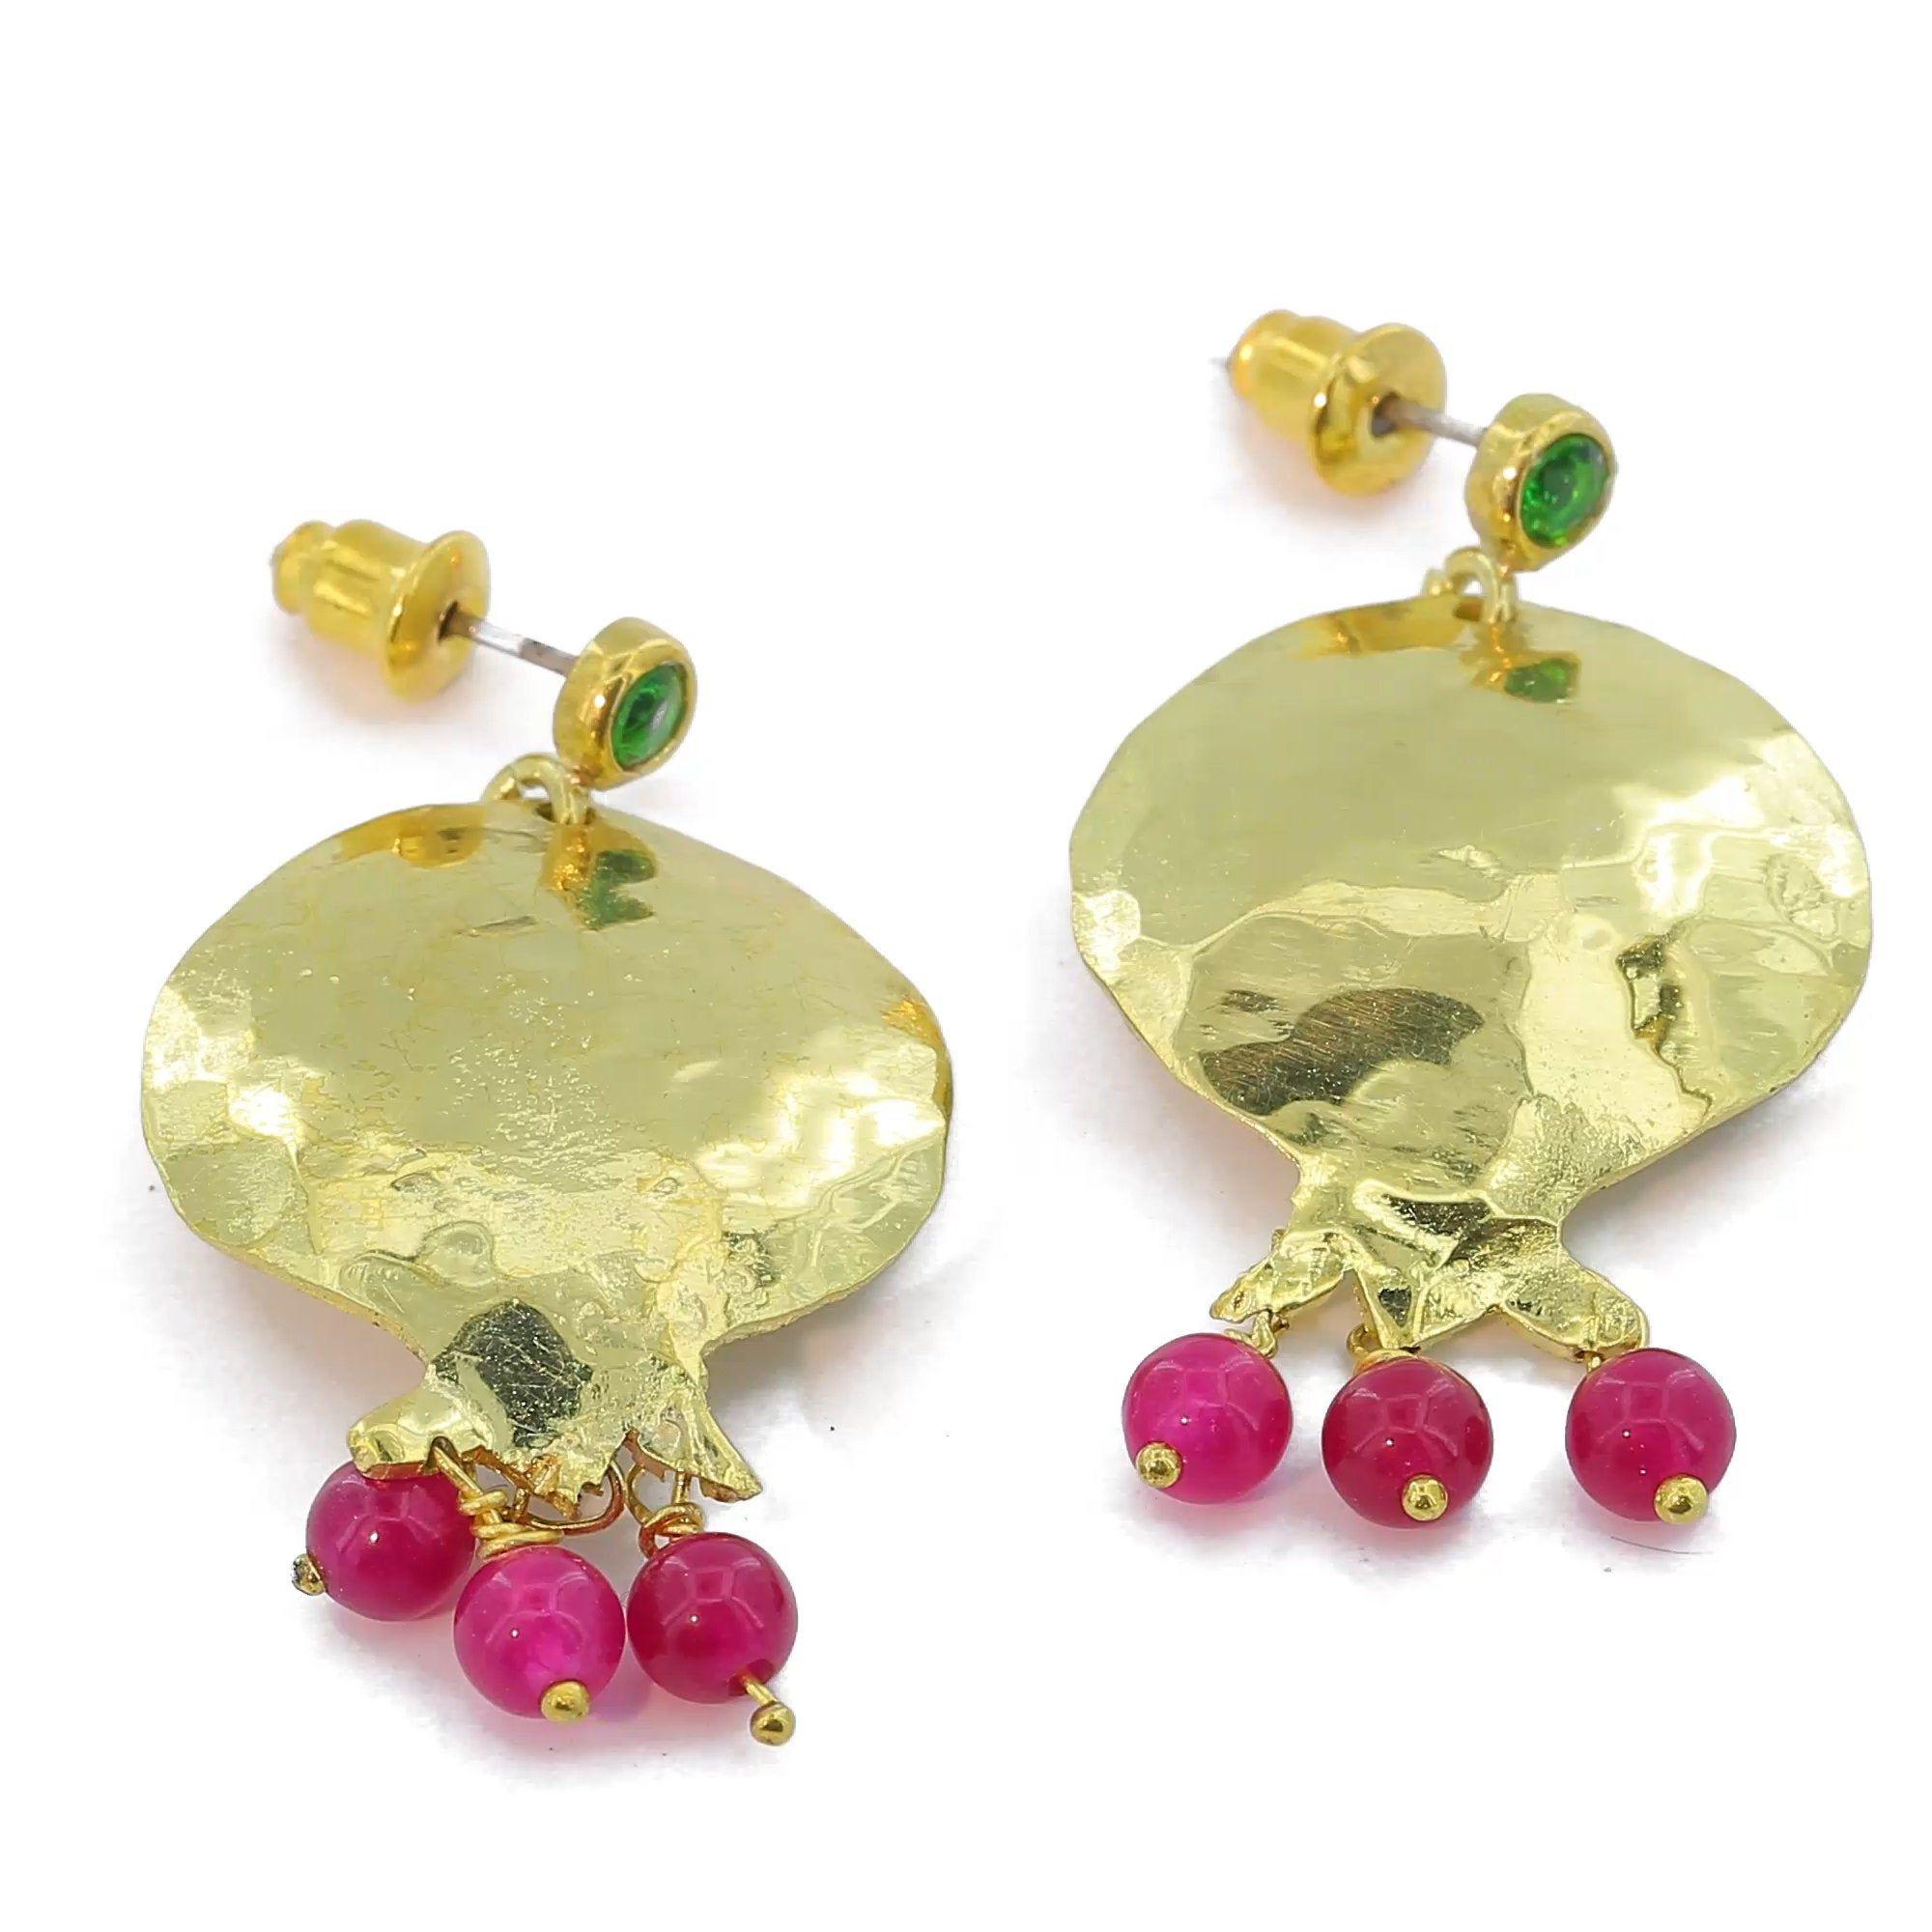 Pomegranate earrings,aesthetic jewelry,beauty and the beast jewelry,israeli jewelry,jewish jewelry,pomegranate jewelry,fruit earrings,